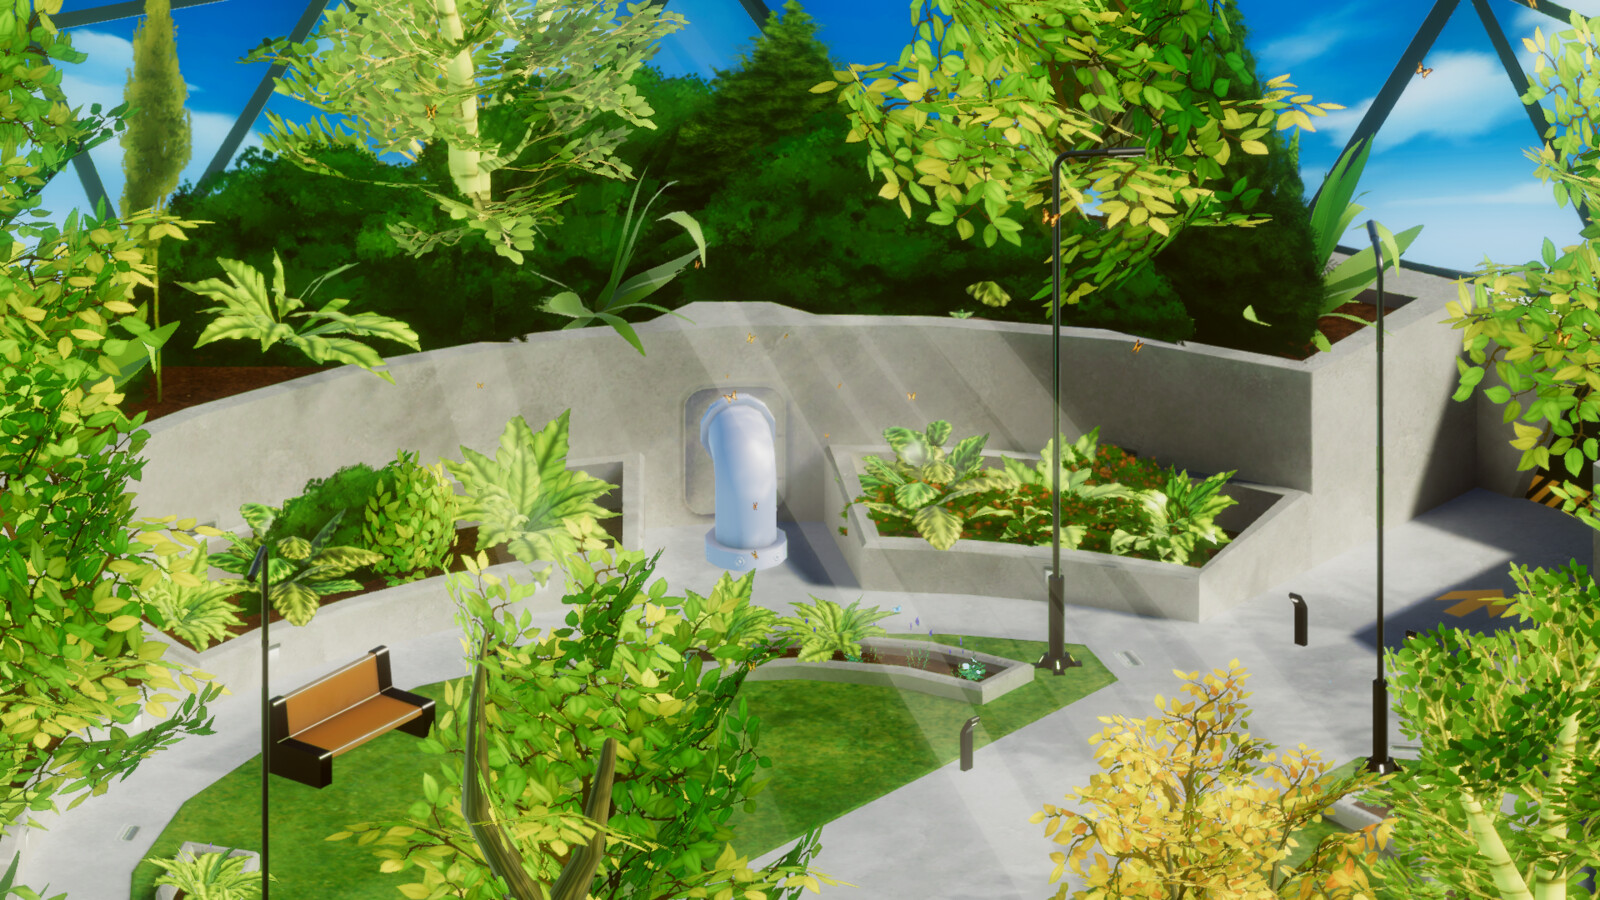 VR mobile stylized enviro dome park 3